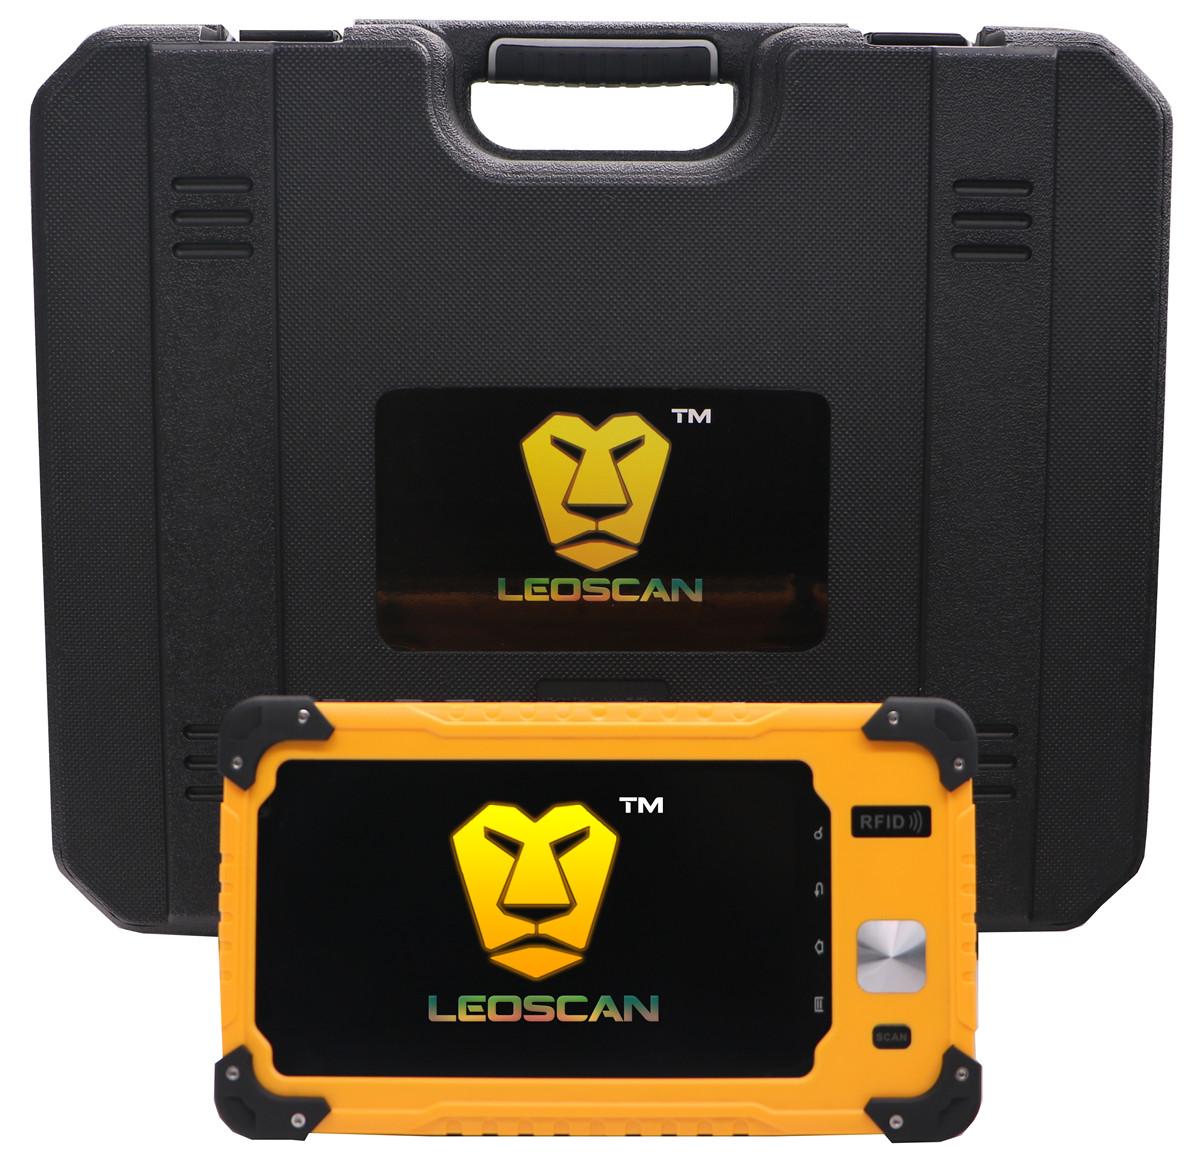 Original car diagnostic tool manufacturer Bluetooth waterproof scanner for all cars Leoscan PRO7